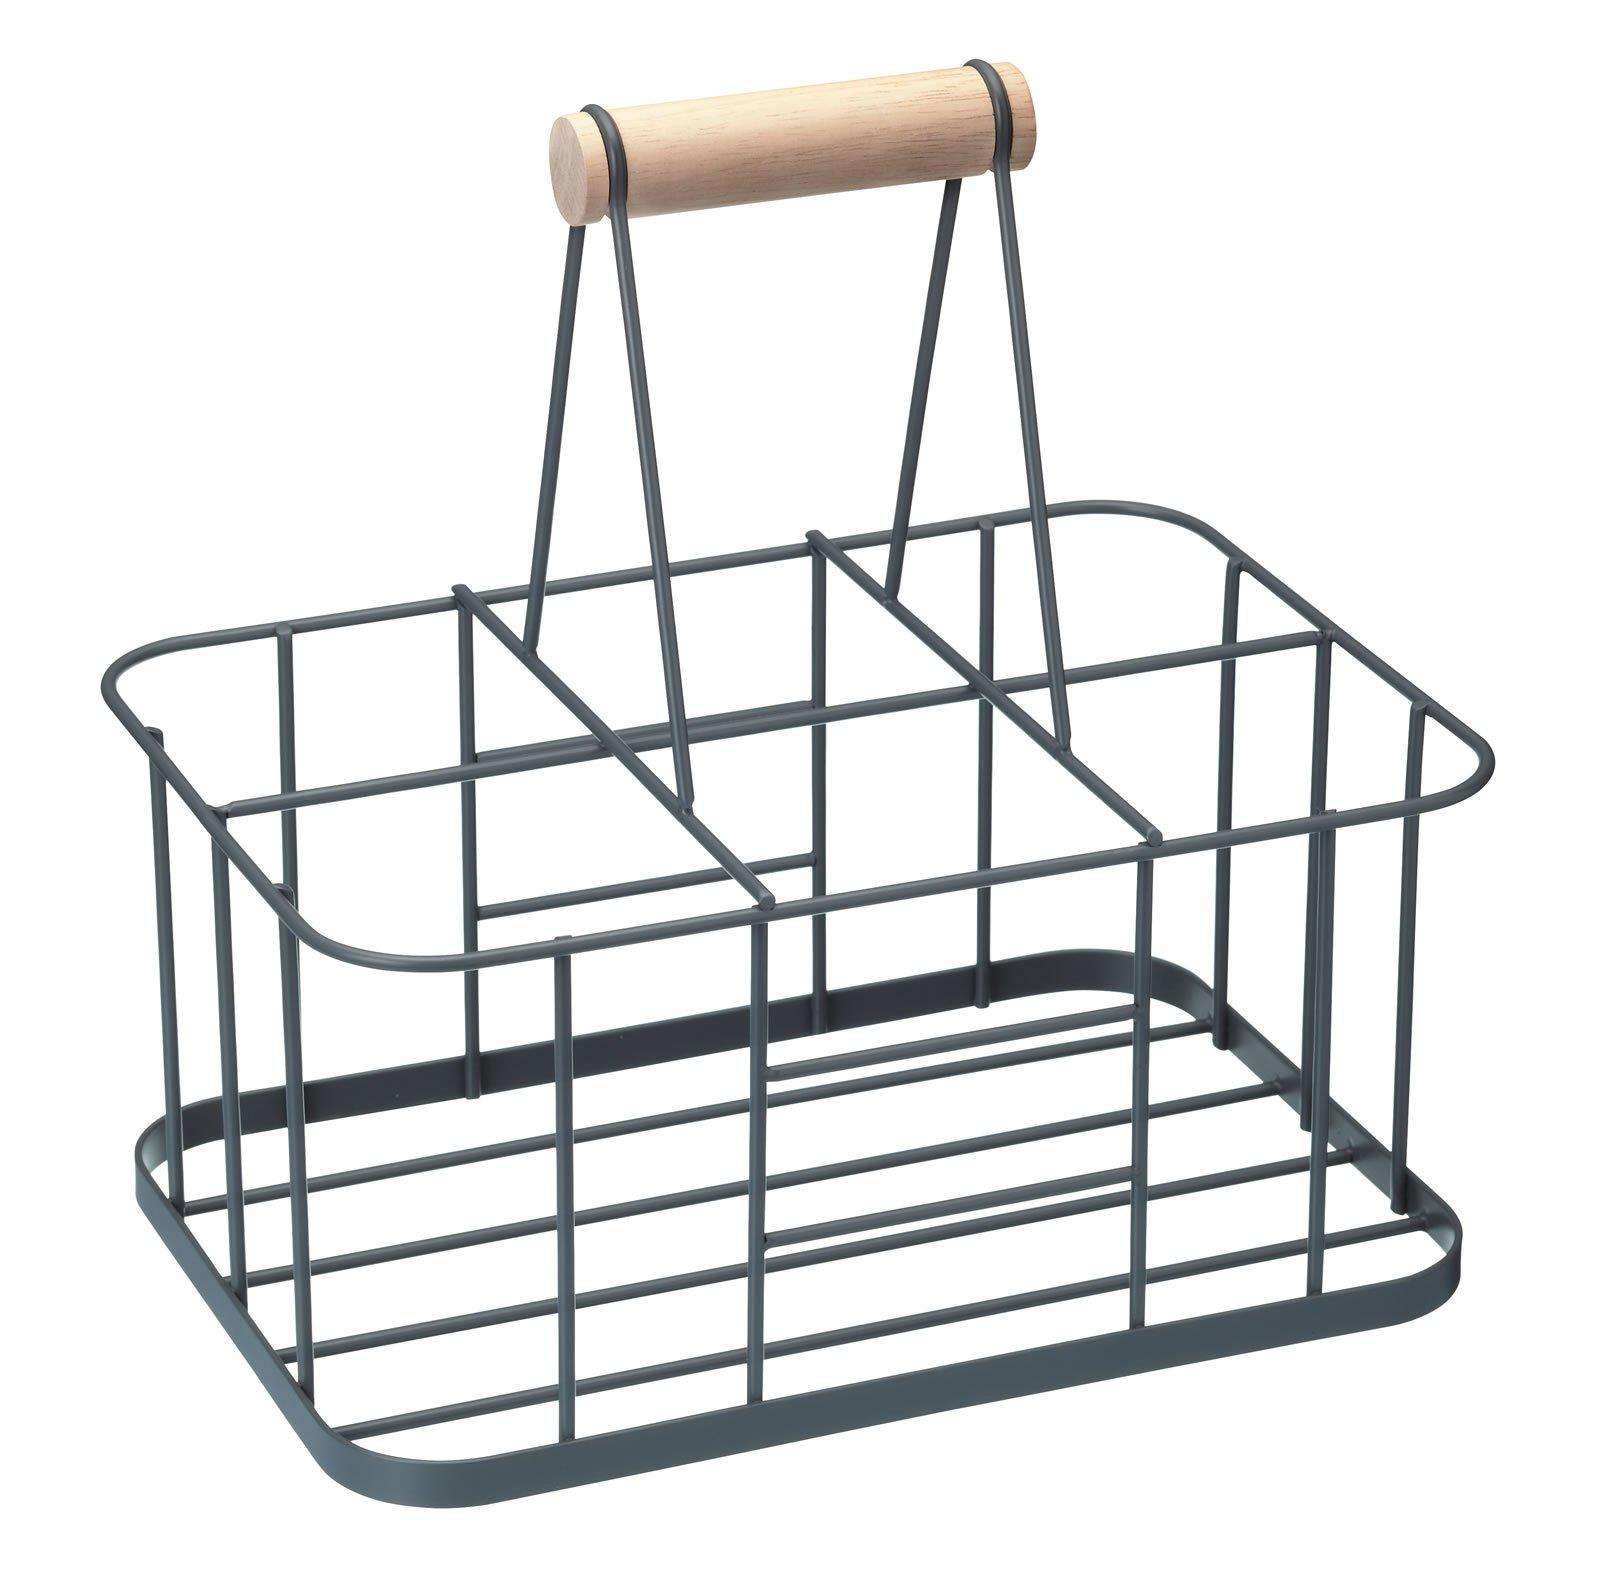 Kitchen Craft Living Nostalgia Metal Bottle Carrier Basket with Handle LNBCARRIER by KitchenCraft